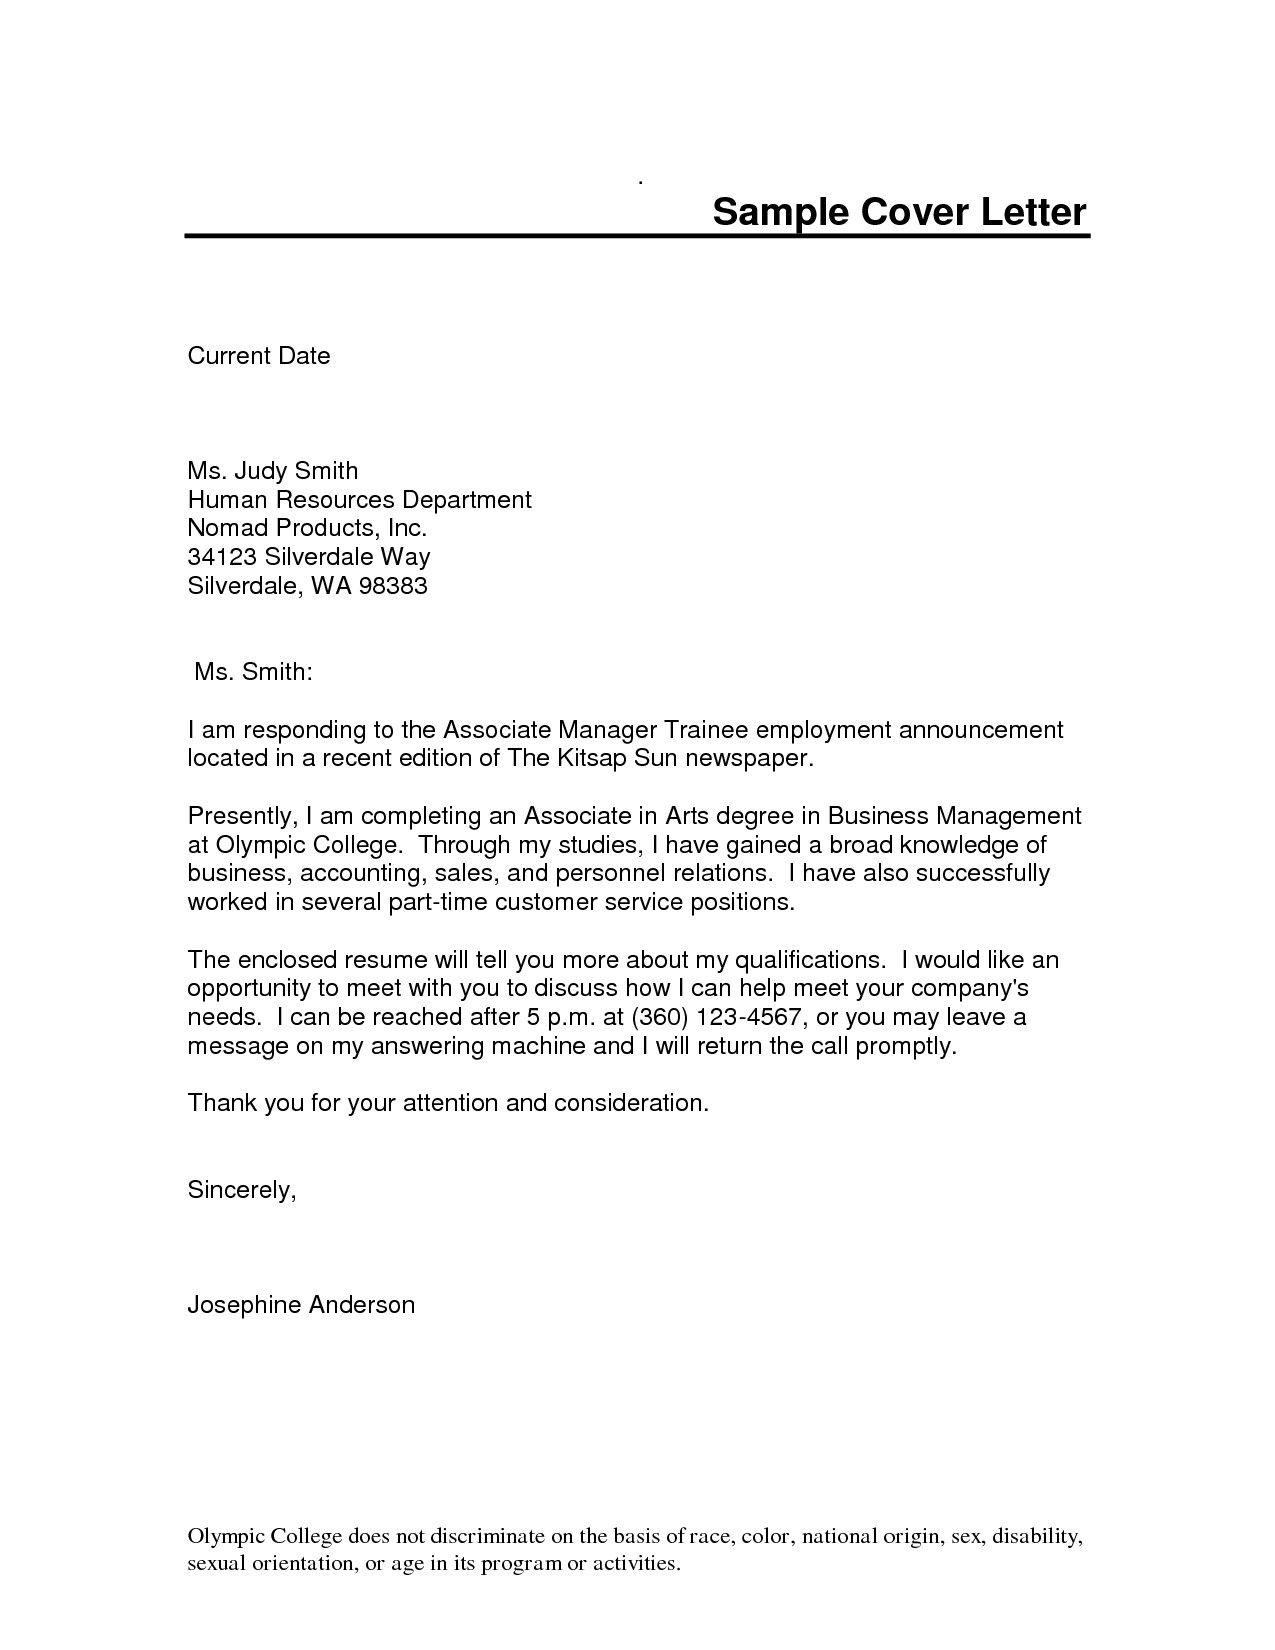 25 Cover Letter Layout Cover Letter Layout Cover Letter